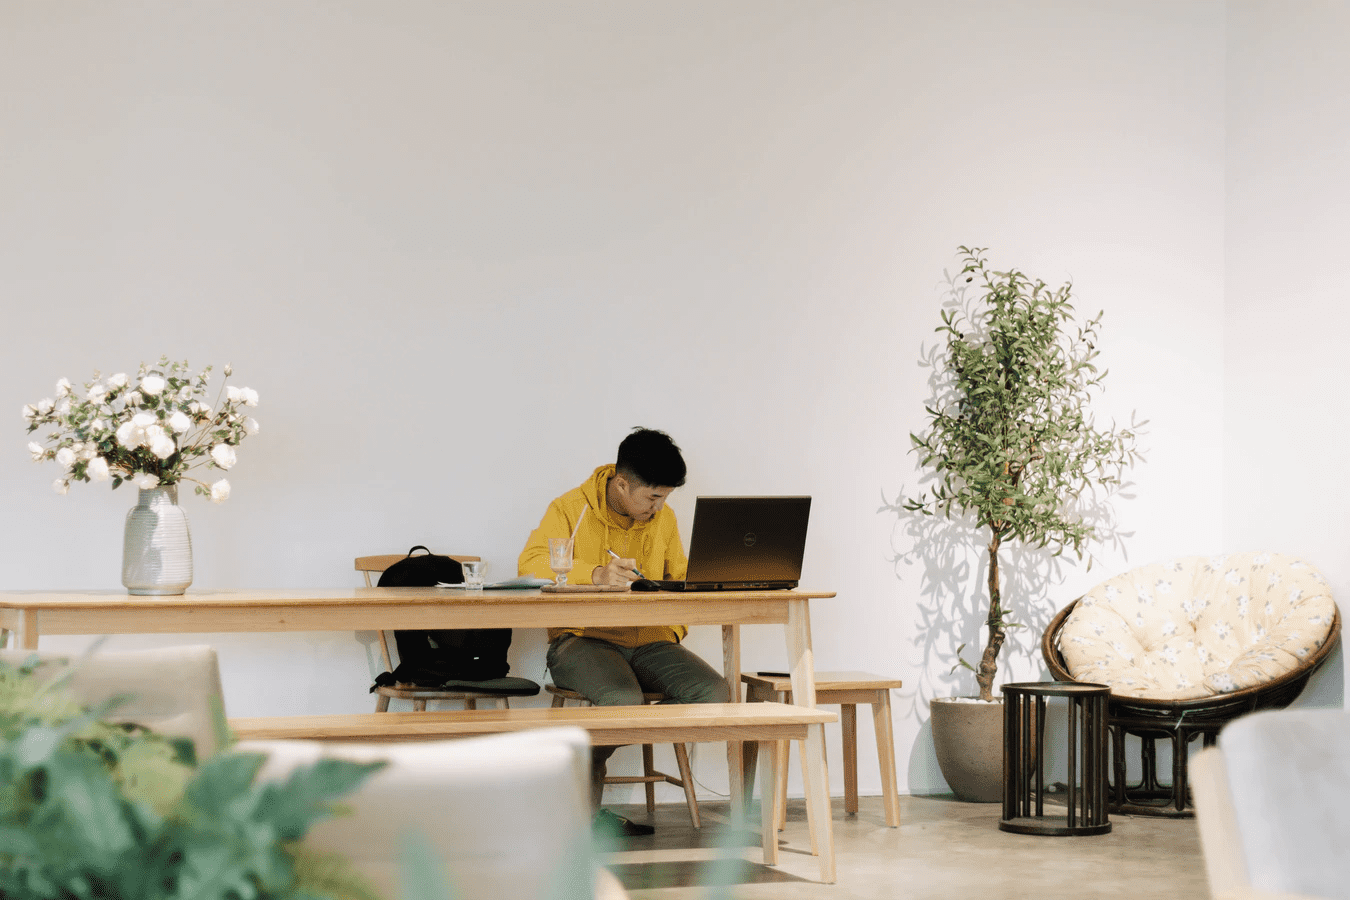 Guy at desk doing remote work